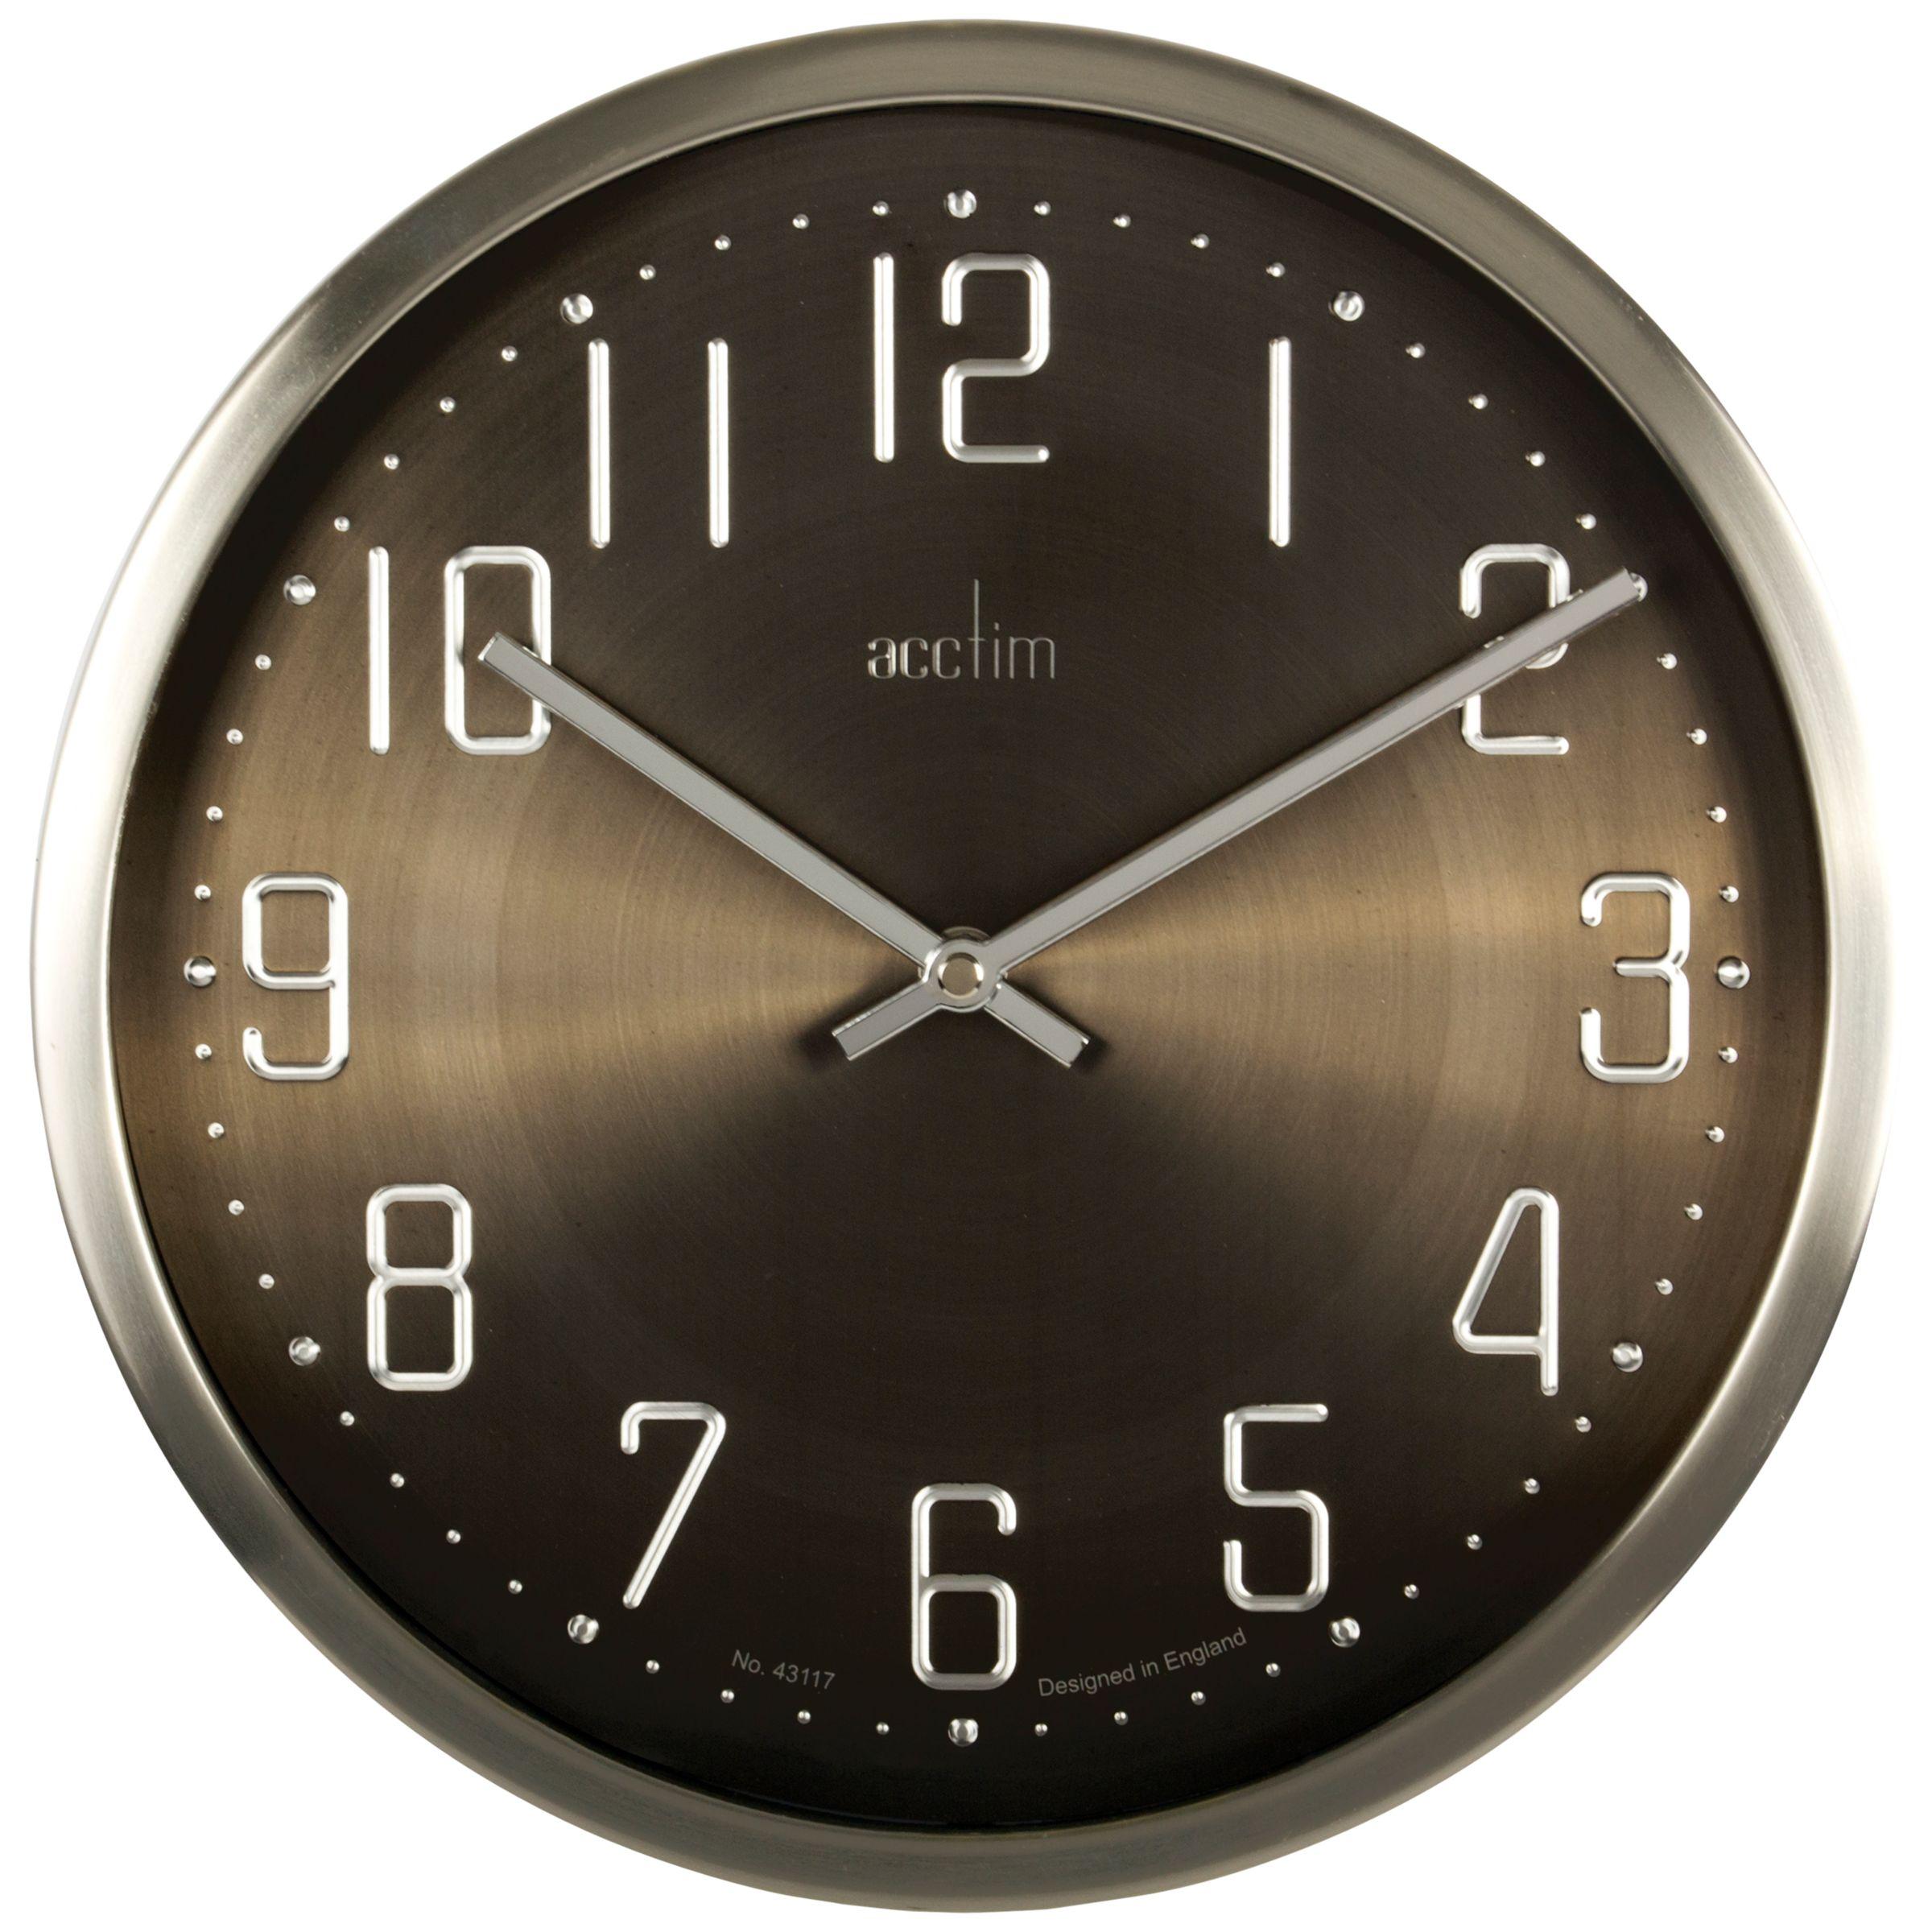 Acctim Acctim Alvik Wall Clock, Silver, 29cm